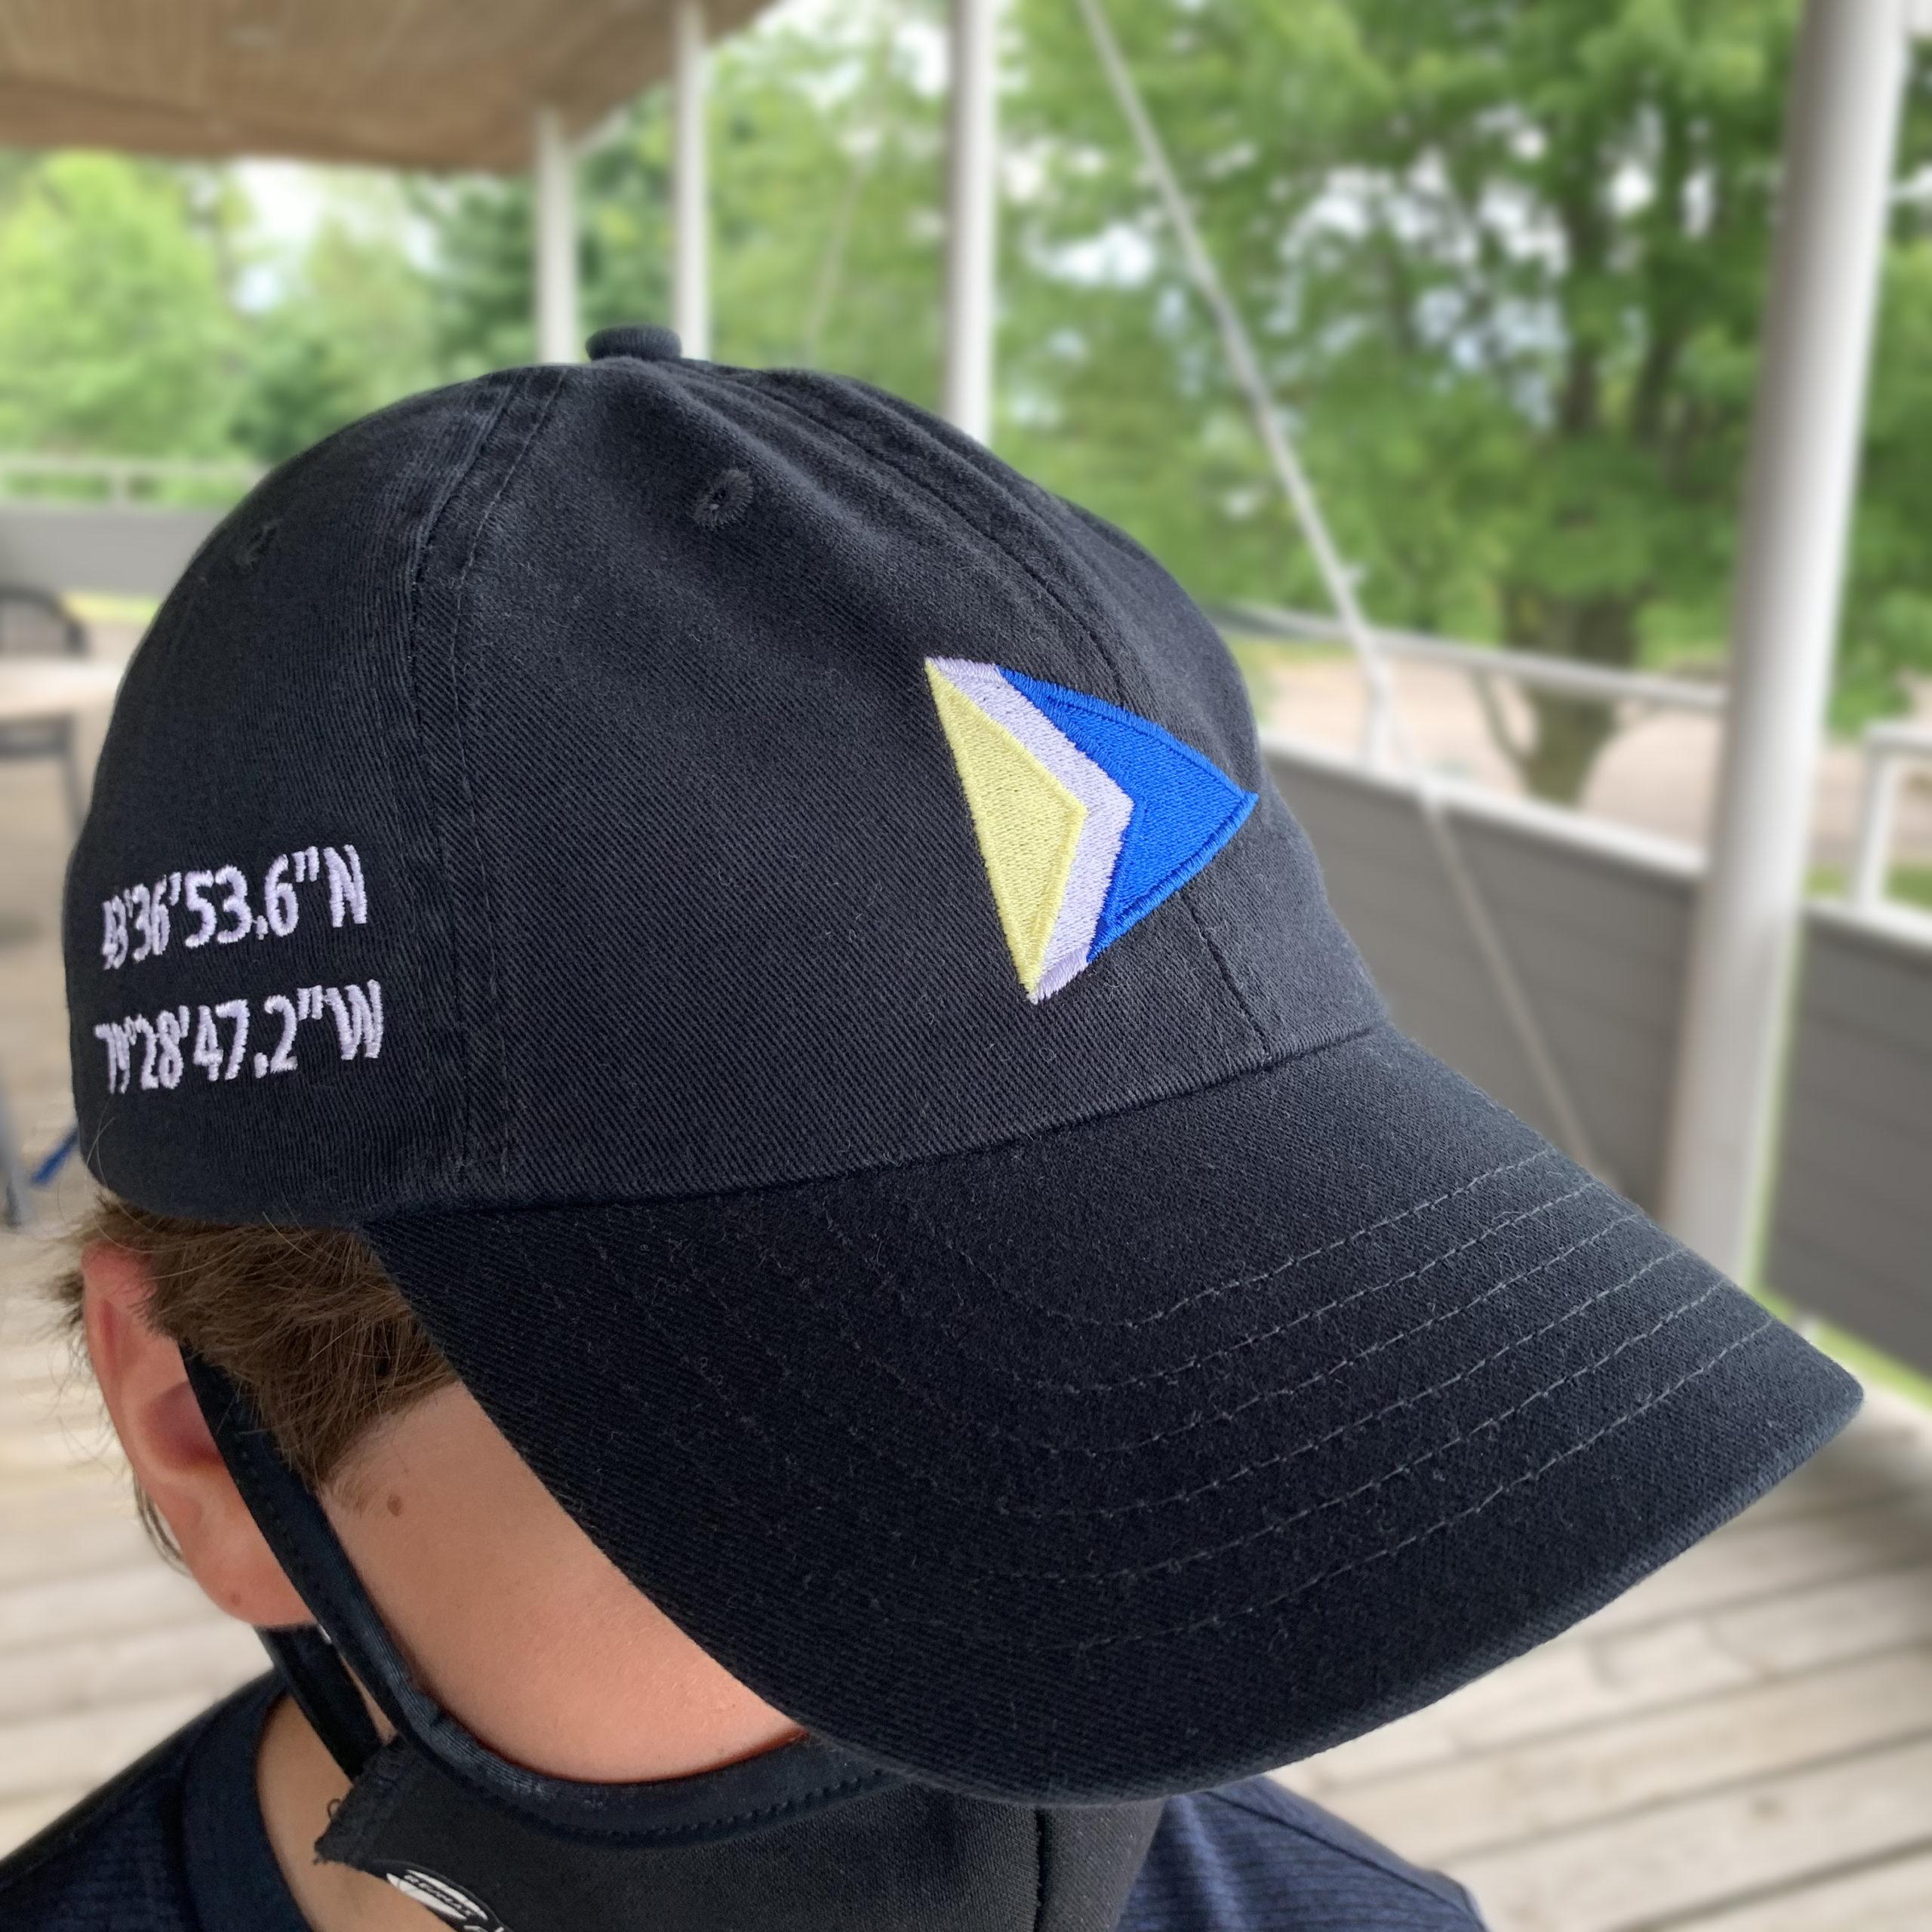 Twill Cap, Navy - $25